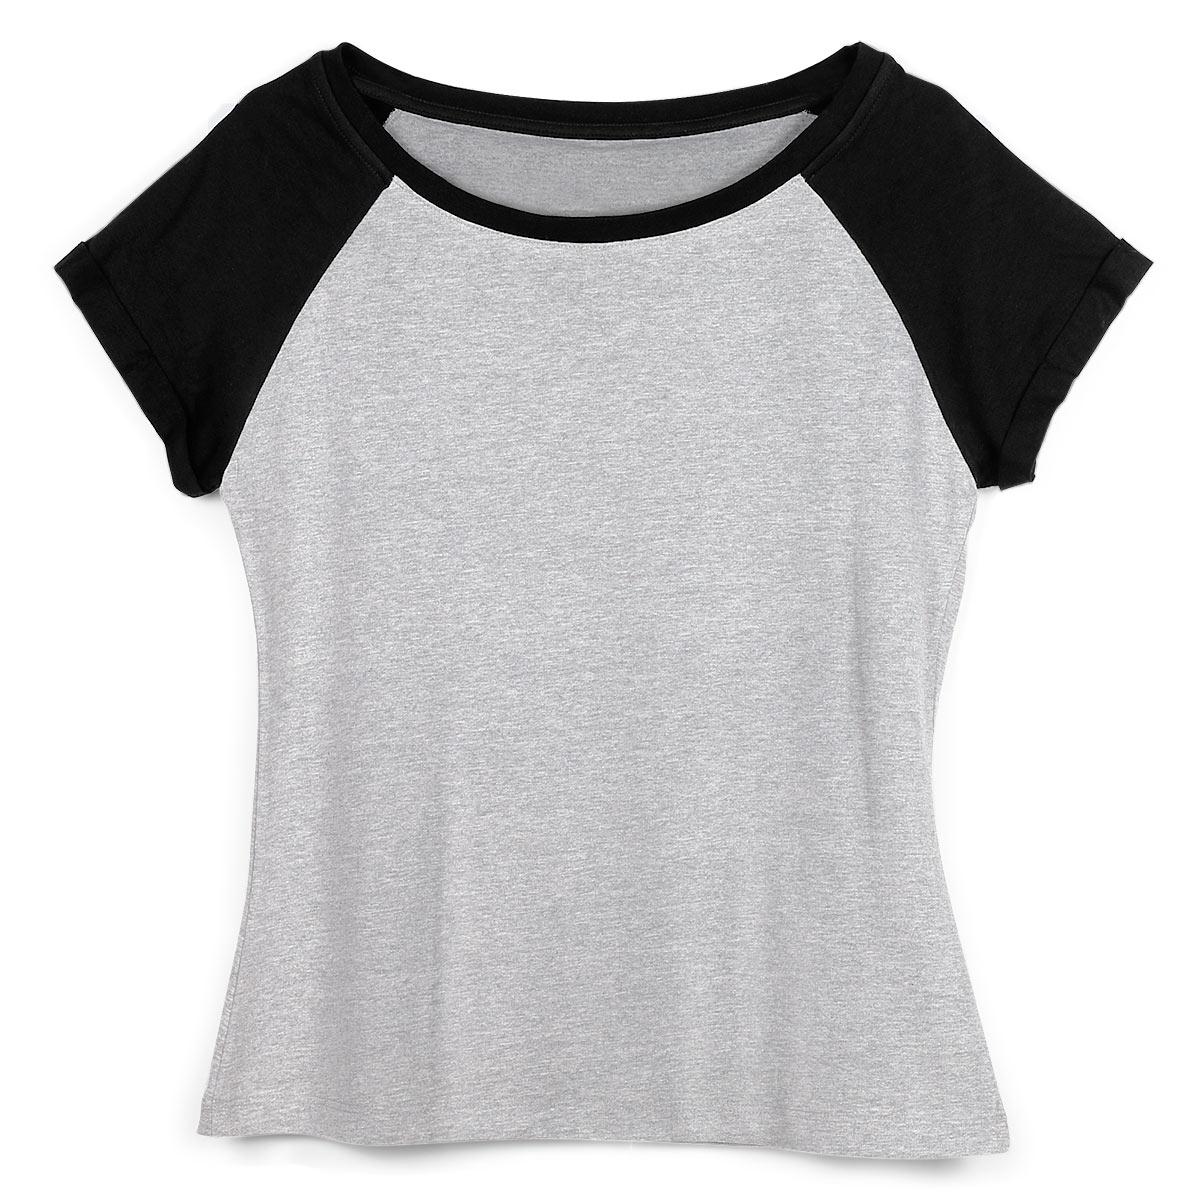 Camiseta Raglan Feminina Mescla e Preto